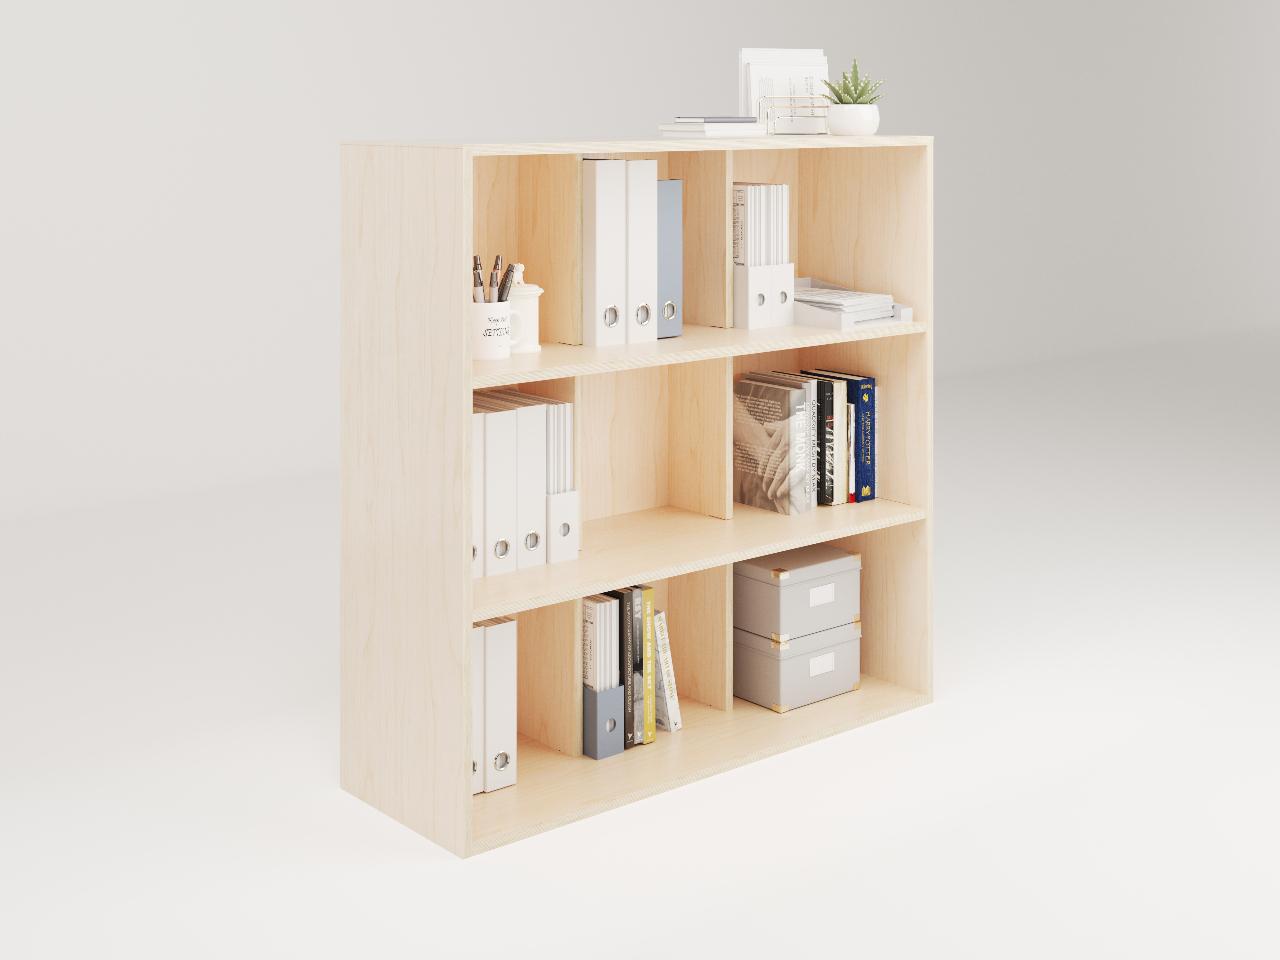 Le Bookshelf